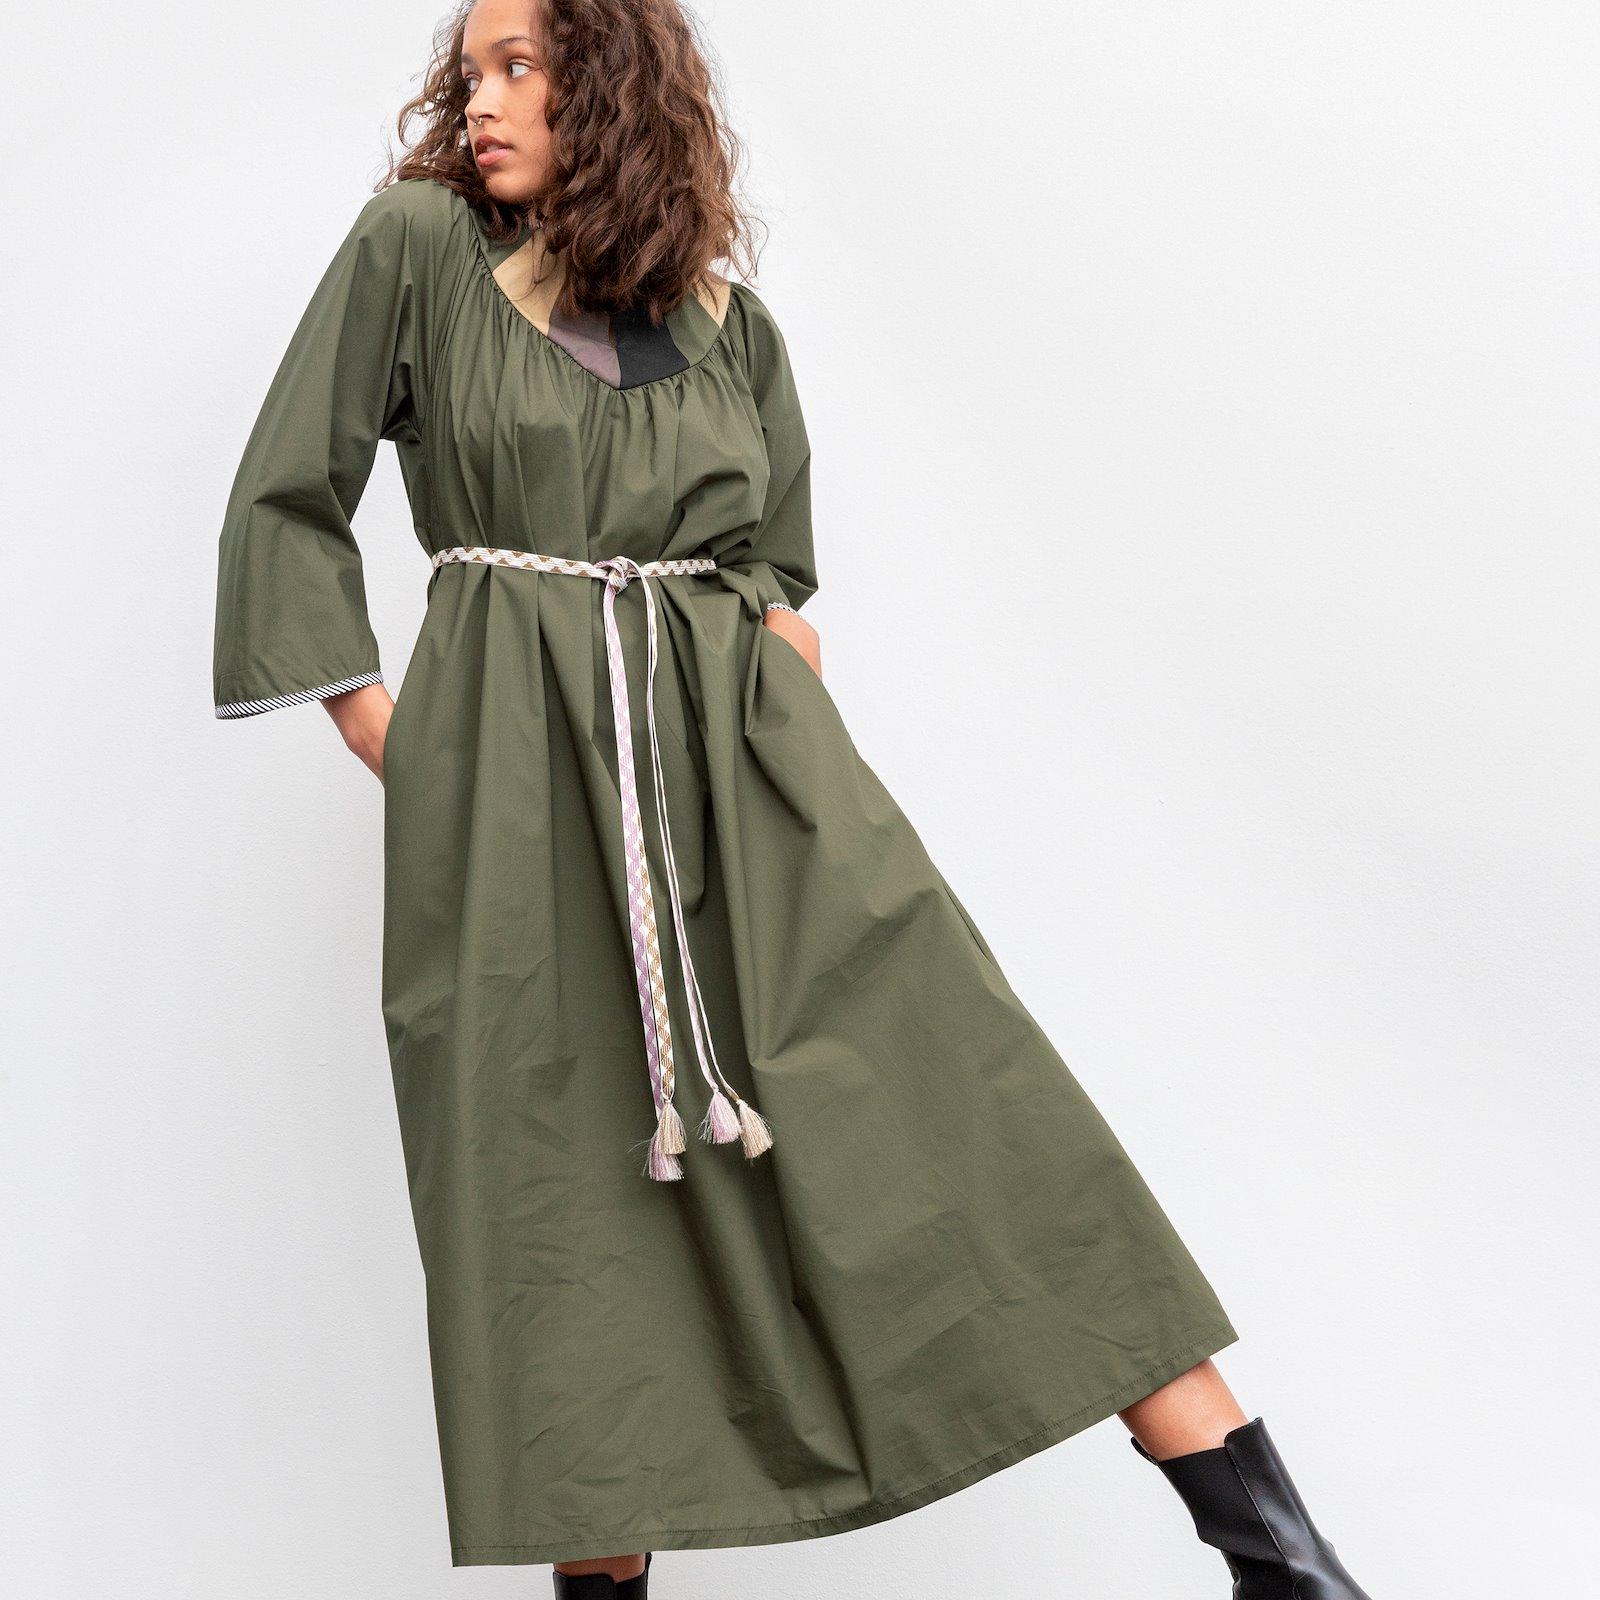 Oversize dress with yoke piece p23169_540122_540120_540121_540110_64106_22359_22361_sskit